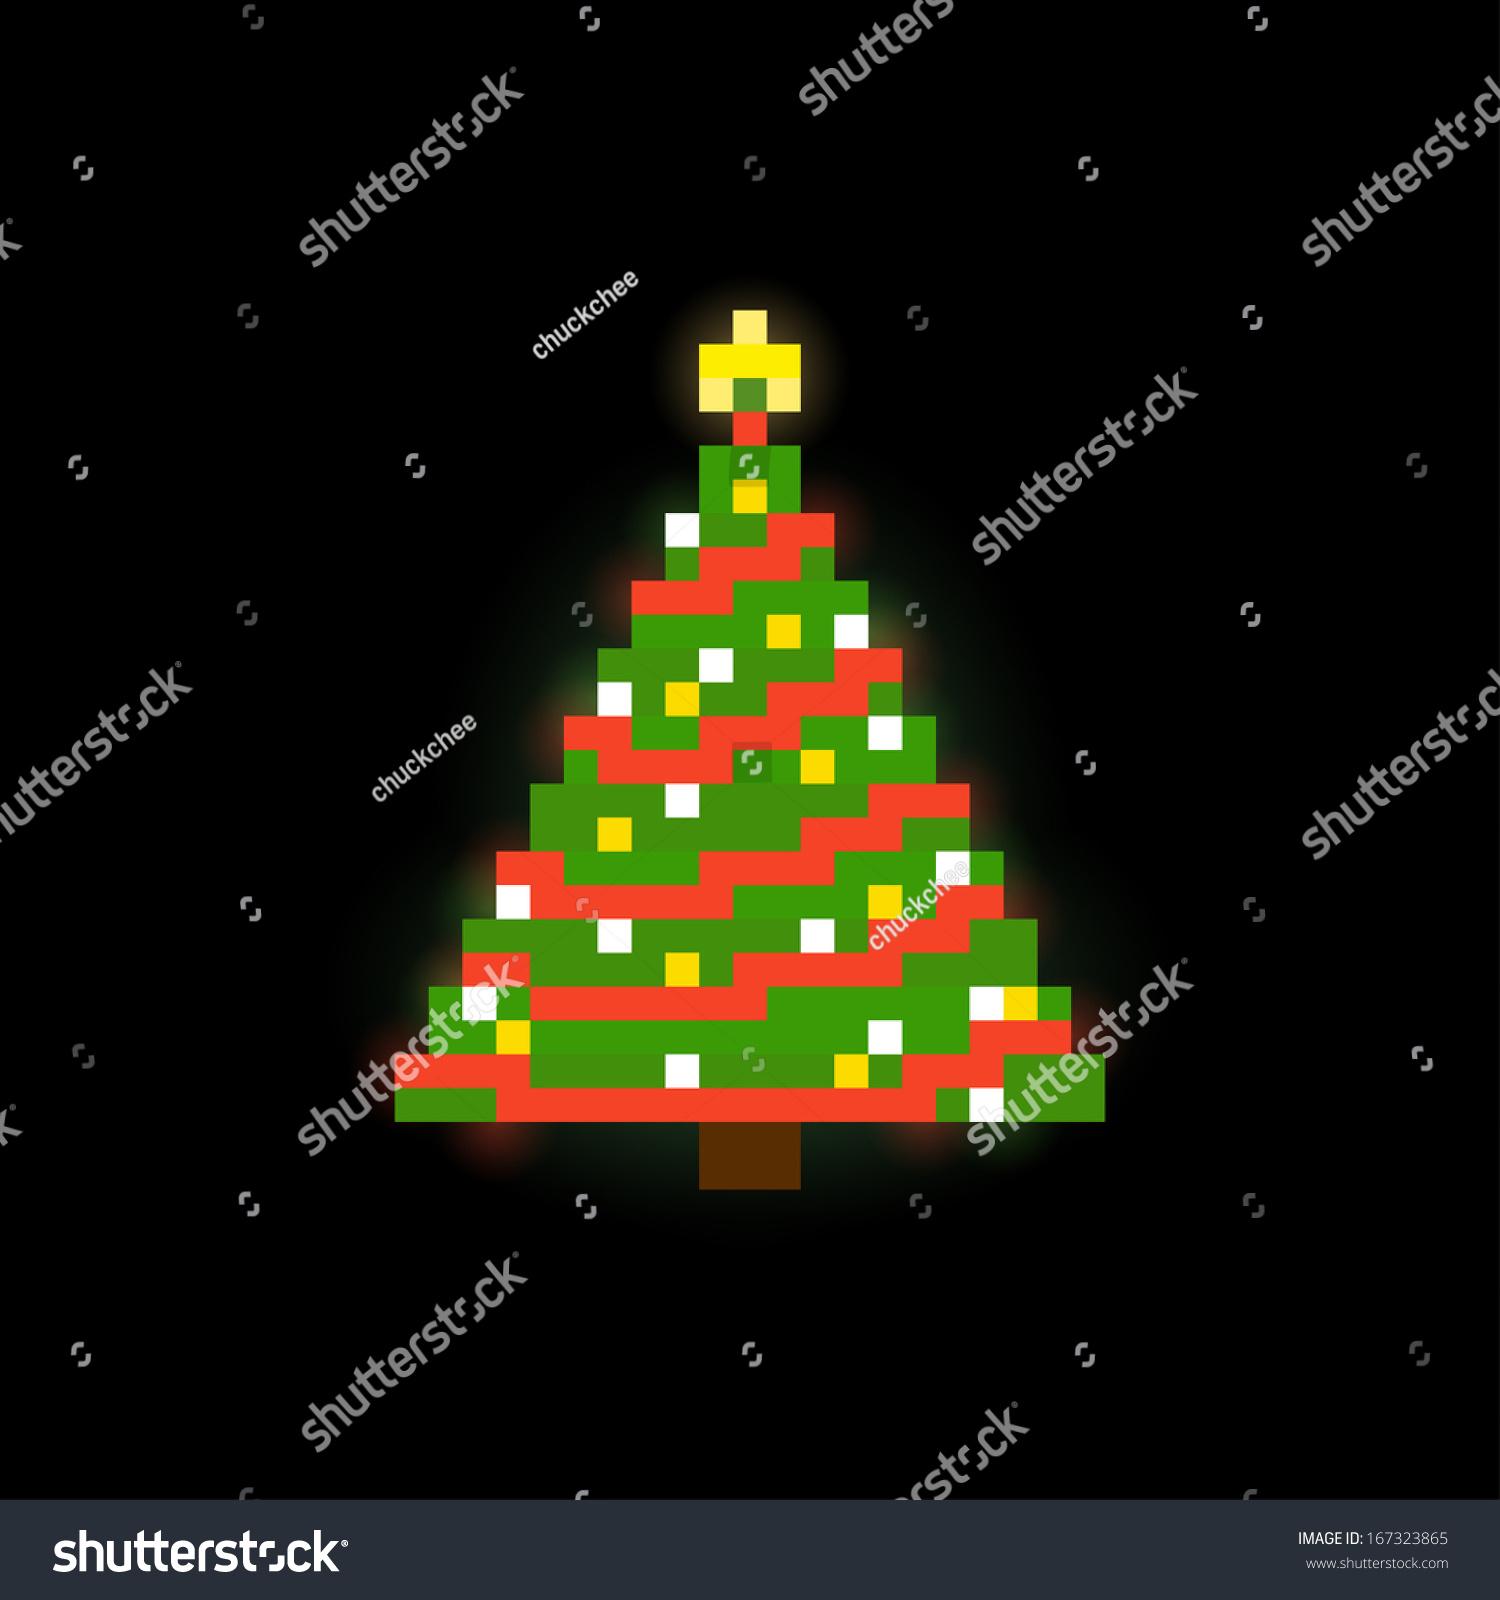 Pixel Art Christmas Tree On Dark Stock Vector 167323865 - Shutterstock